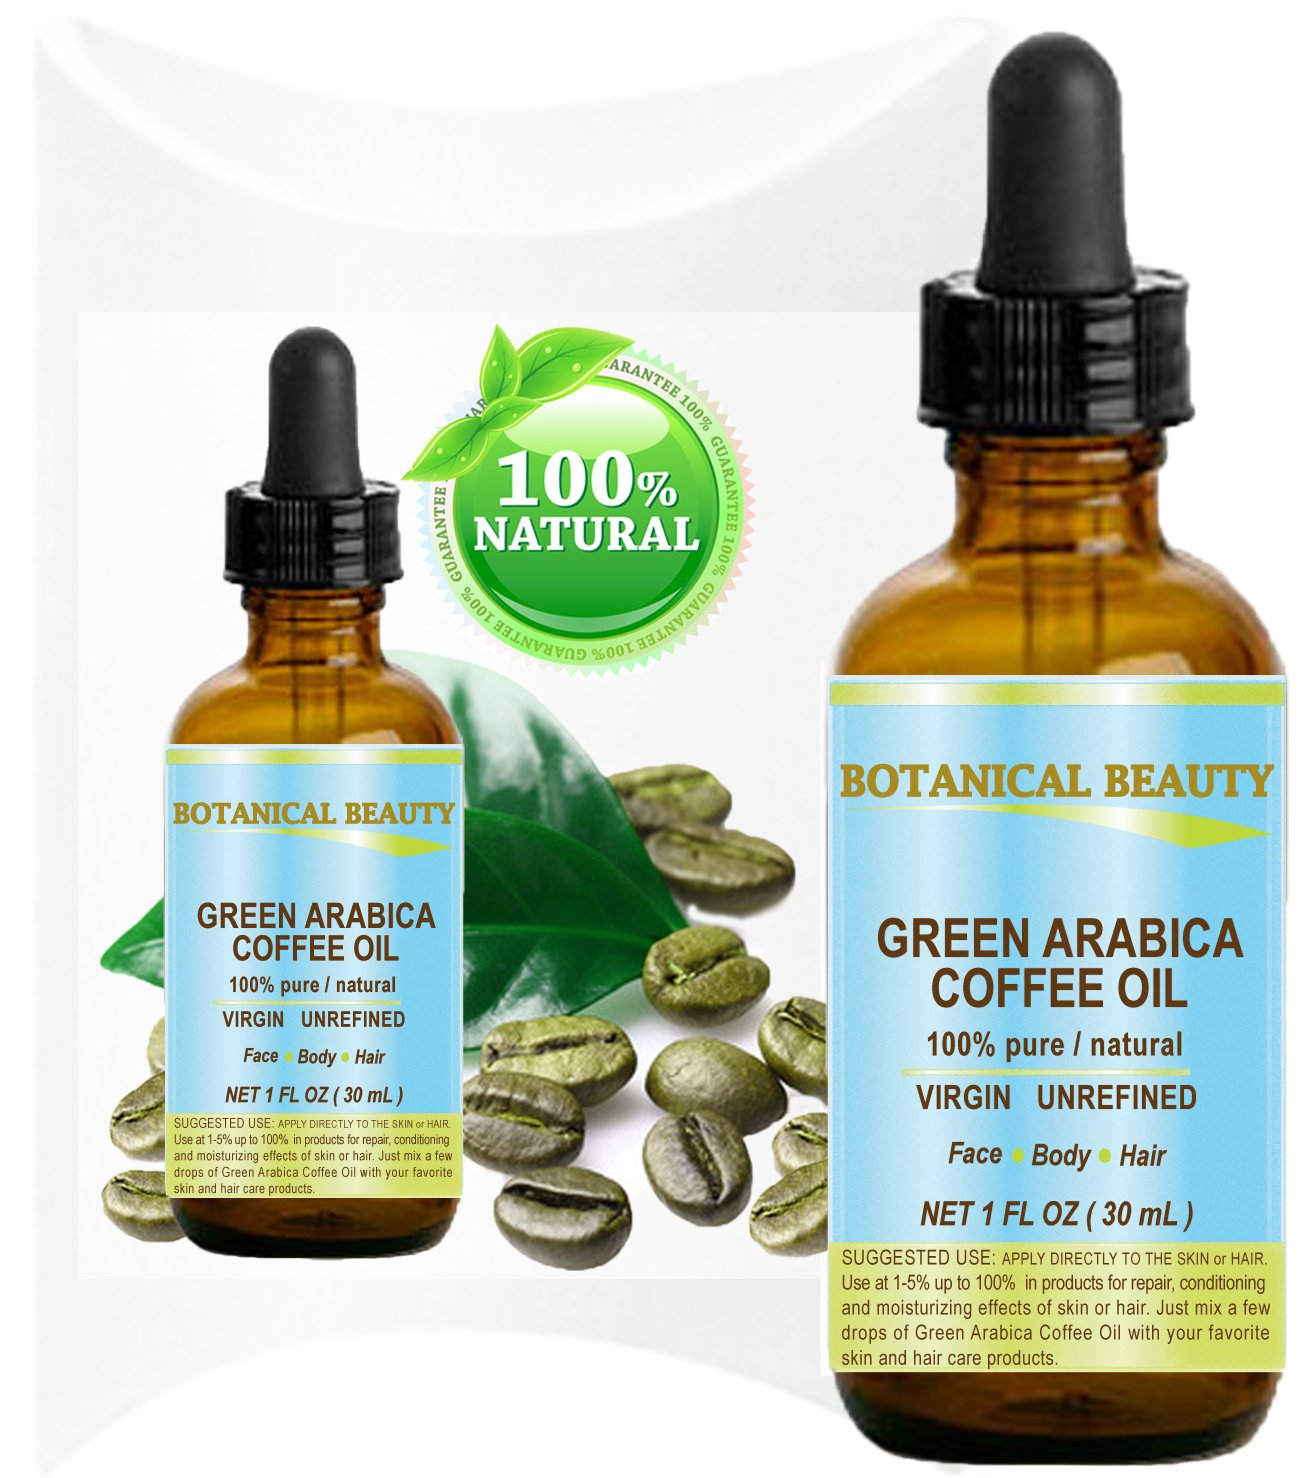 GREEN ARABICA COFFEE OIL Brazilian. 1 Fl.oz- 30 ml. 100% Pure/Premium Quality. For Skin, Hair, Lip and Nail Care. Wrinkle Reducer, Skin Lift/Tone, Anti- Puffiness/Dark Circles, Anti Cellulite.